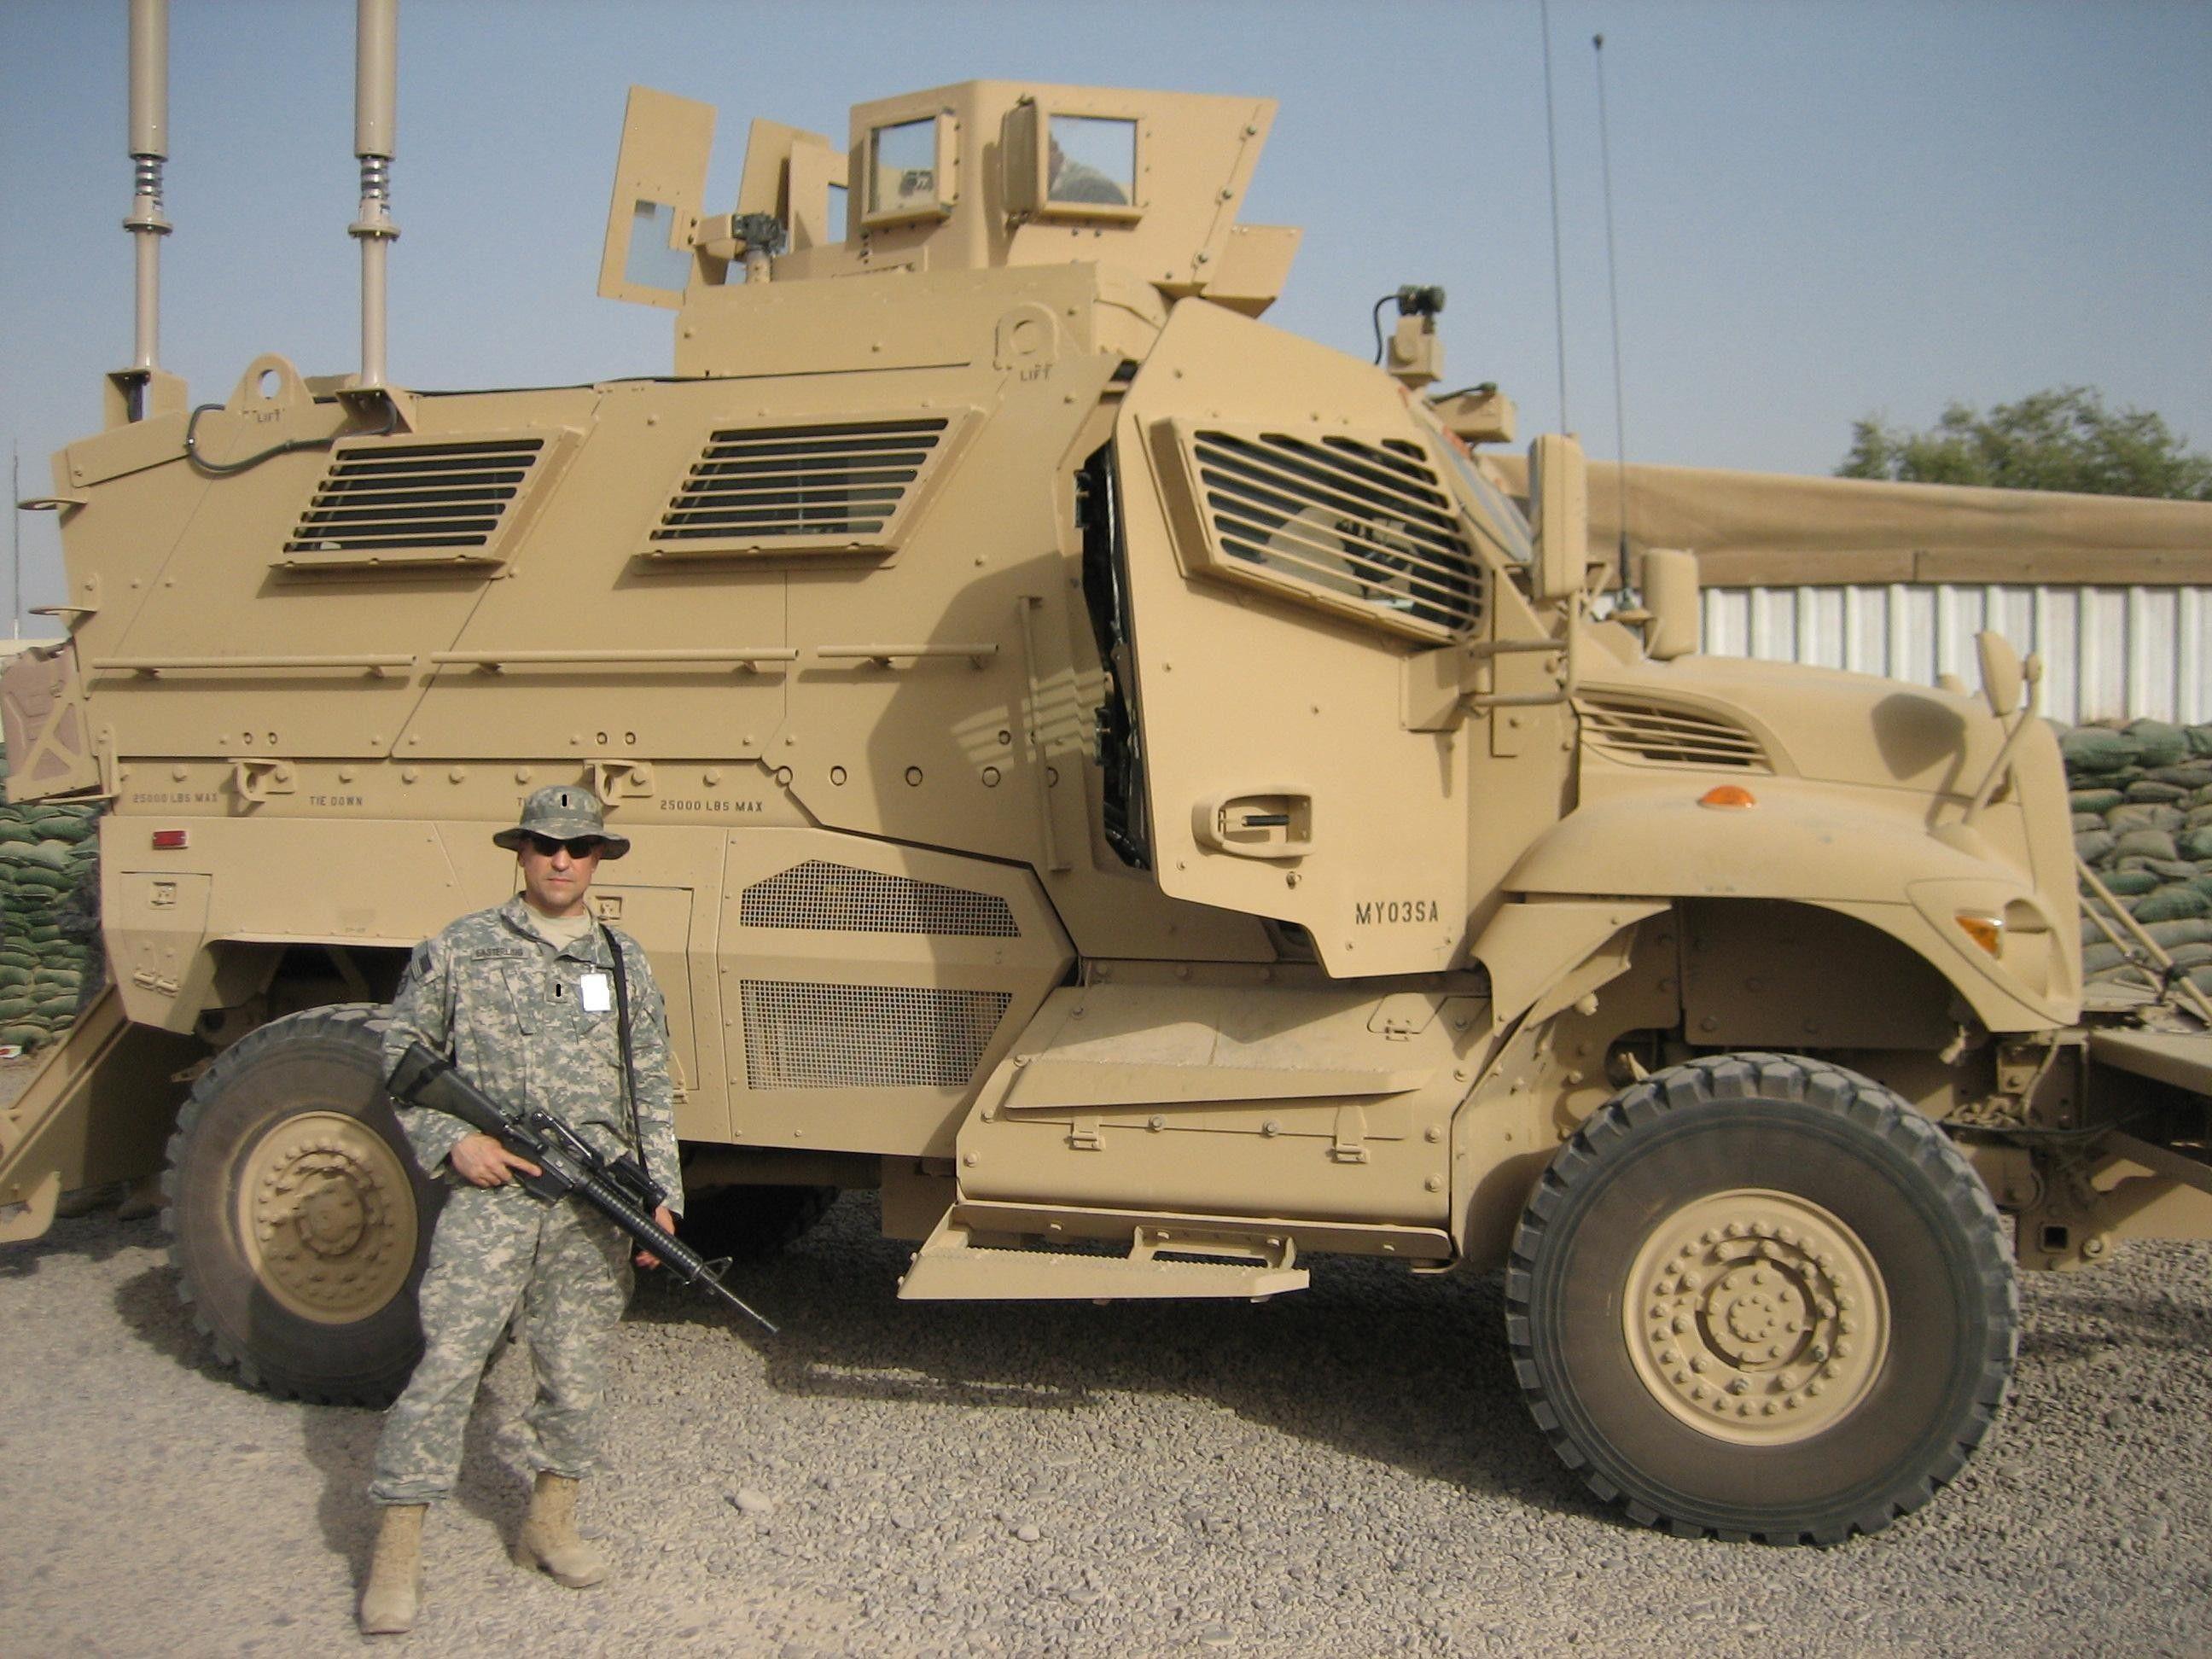 Us Military Orly Taitz Scott R Easterling Officer Easterling